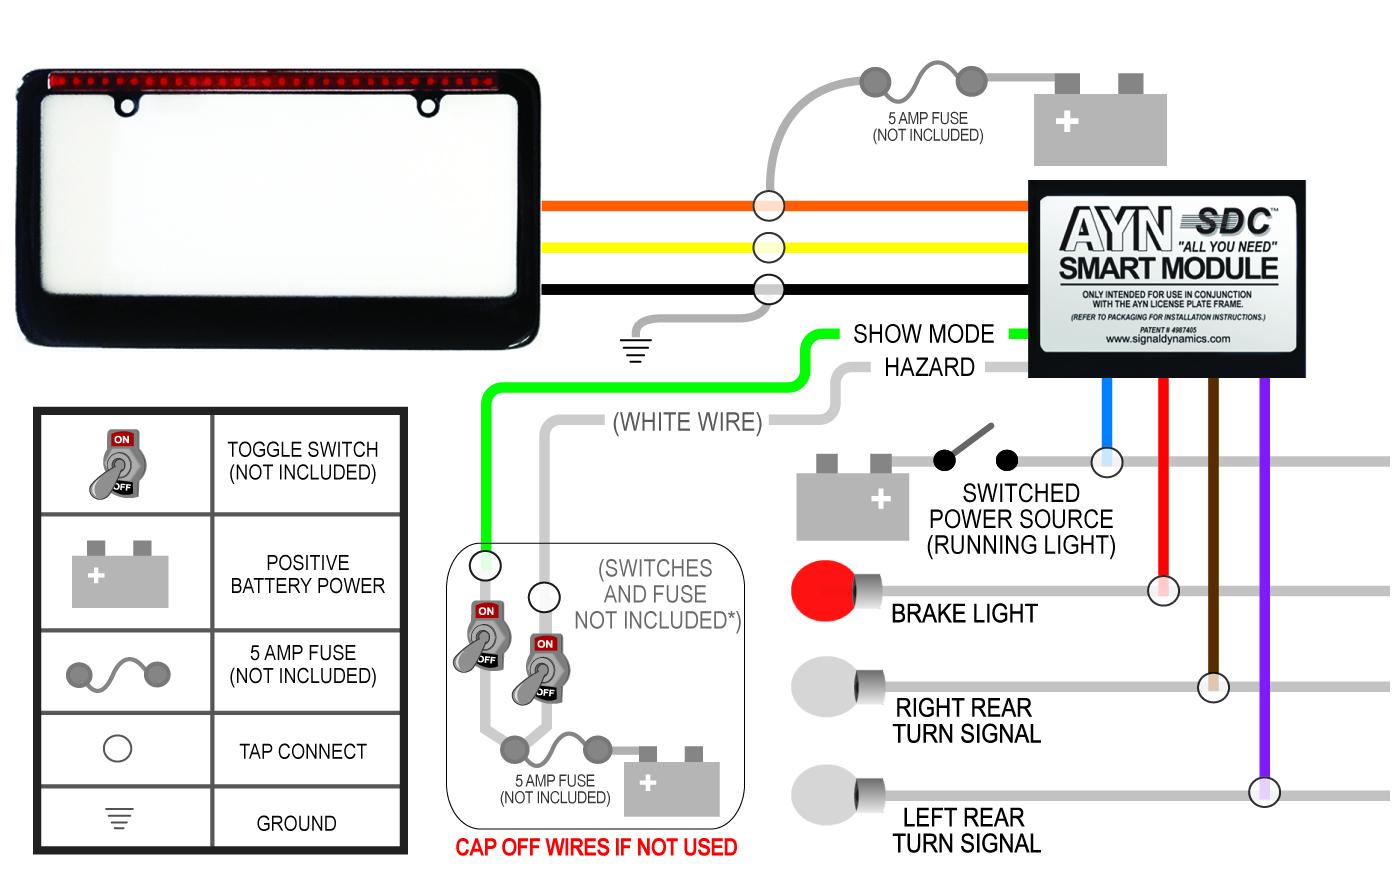 hazard wiring diagram for motorcycle hazard image motorcycle turn signal wiring diagram motorcycle auto wiring on hazard wiring diagram for motorcycle